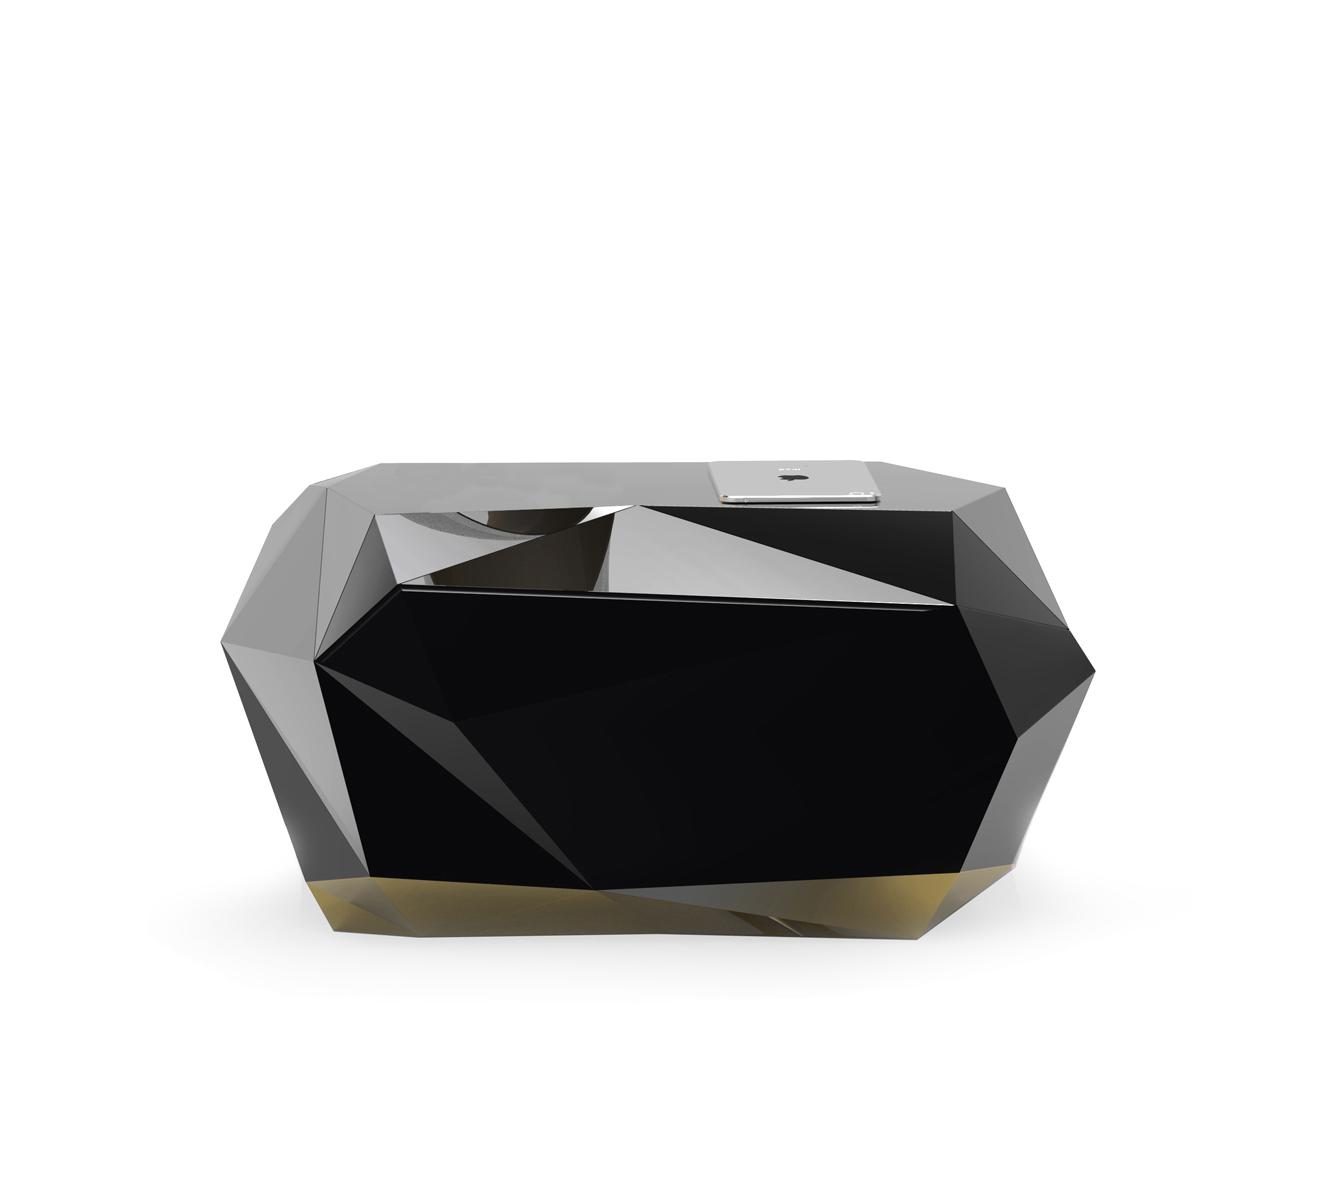 Diamond Nightstand By Boca Do Lobo Demorais International